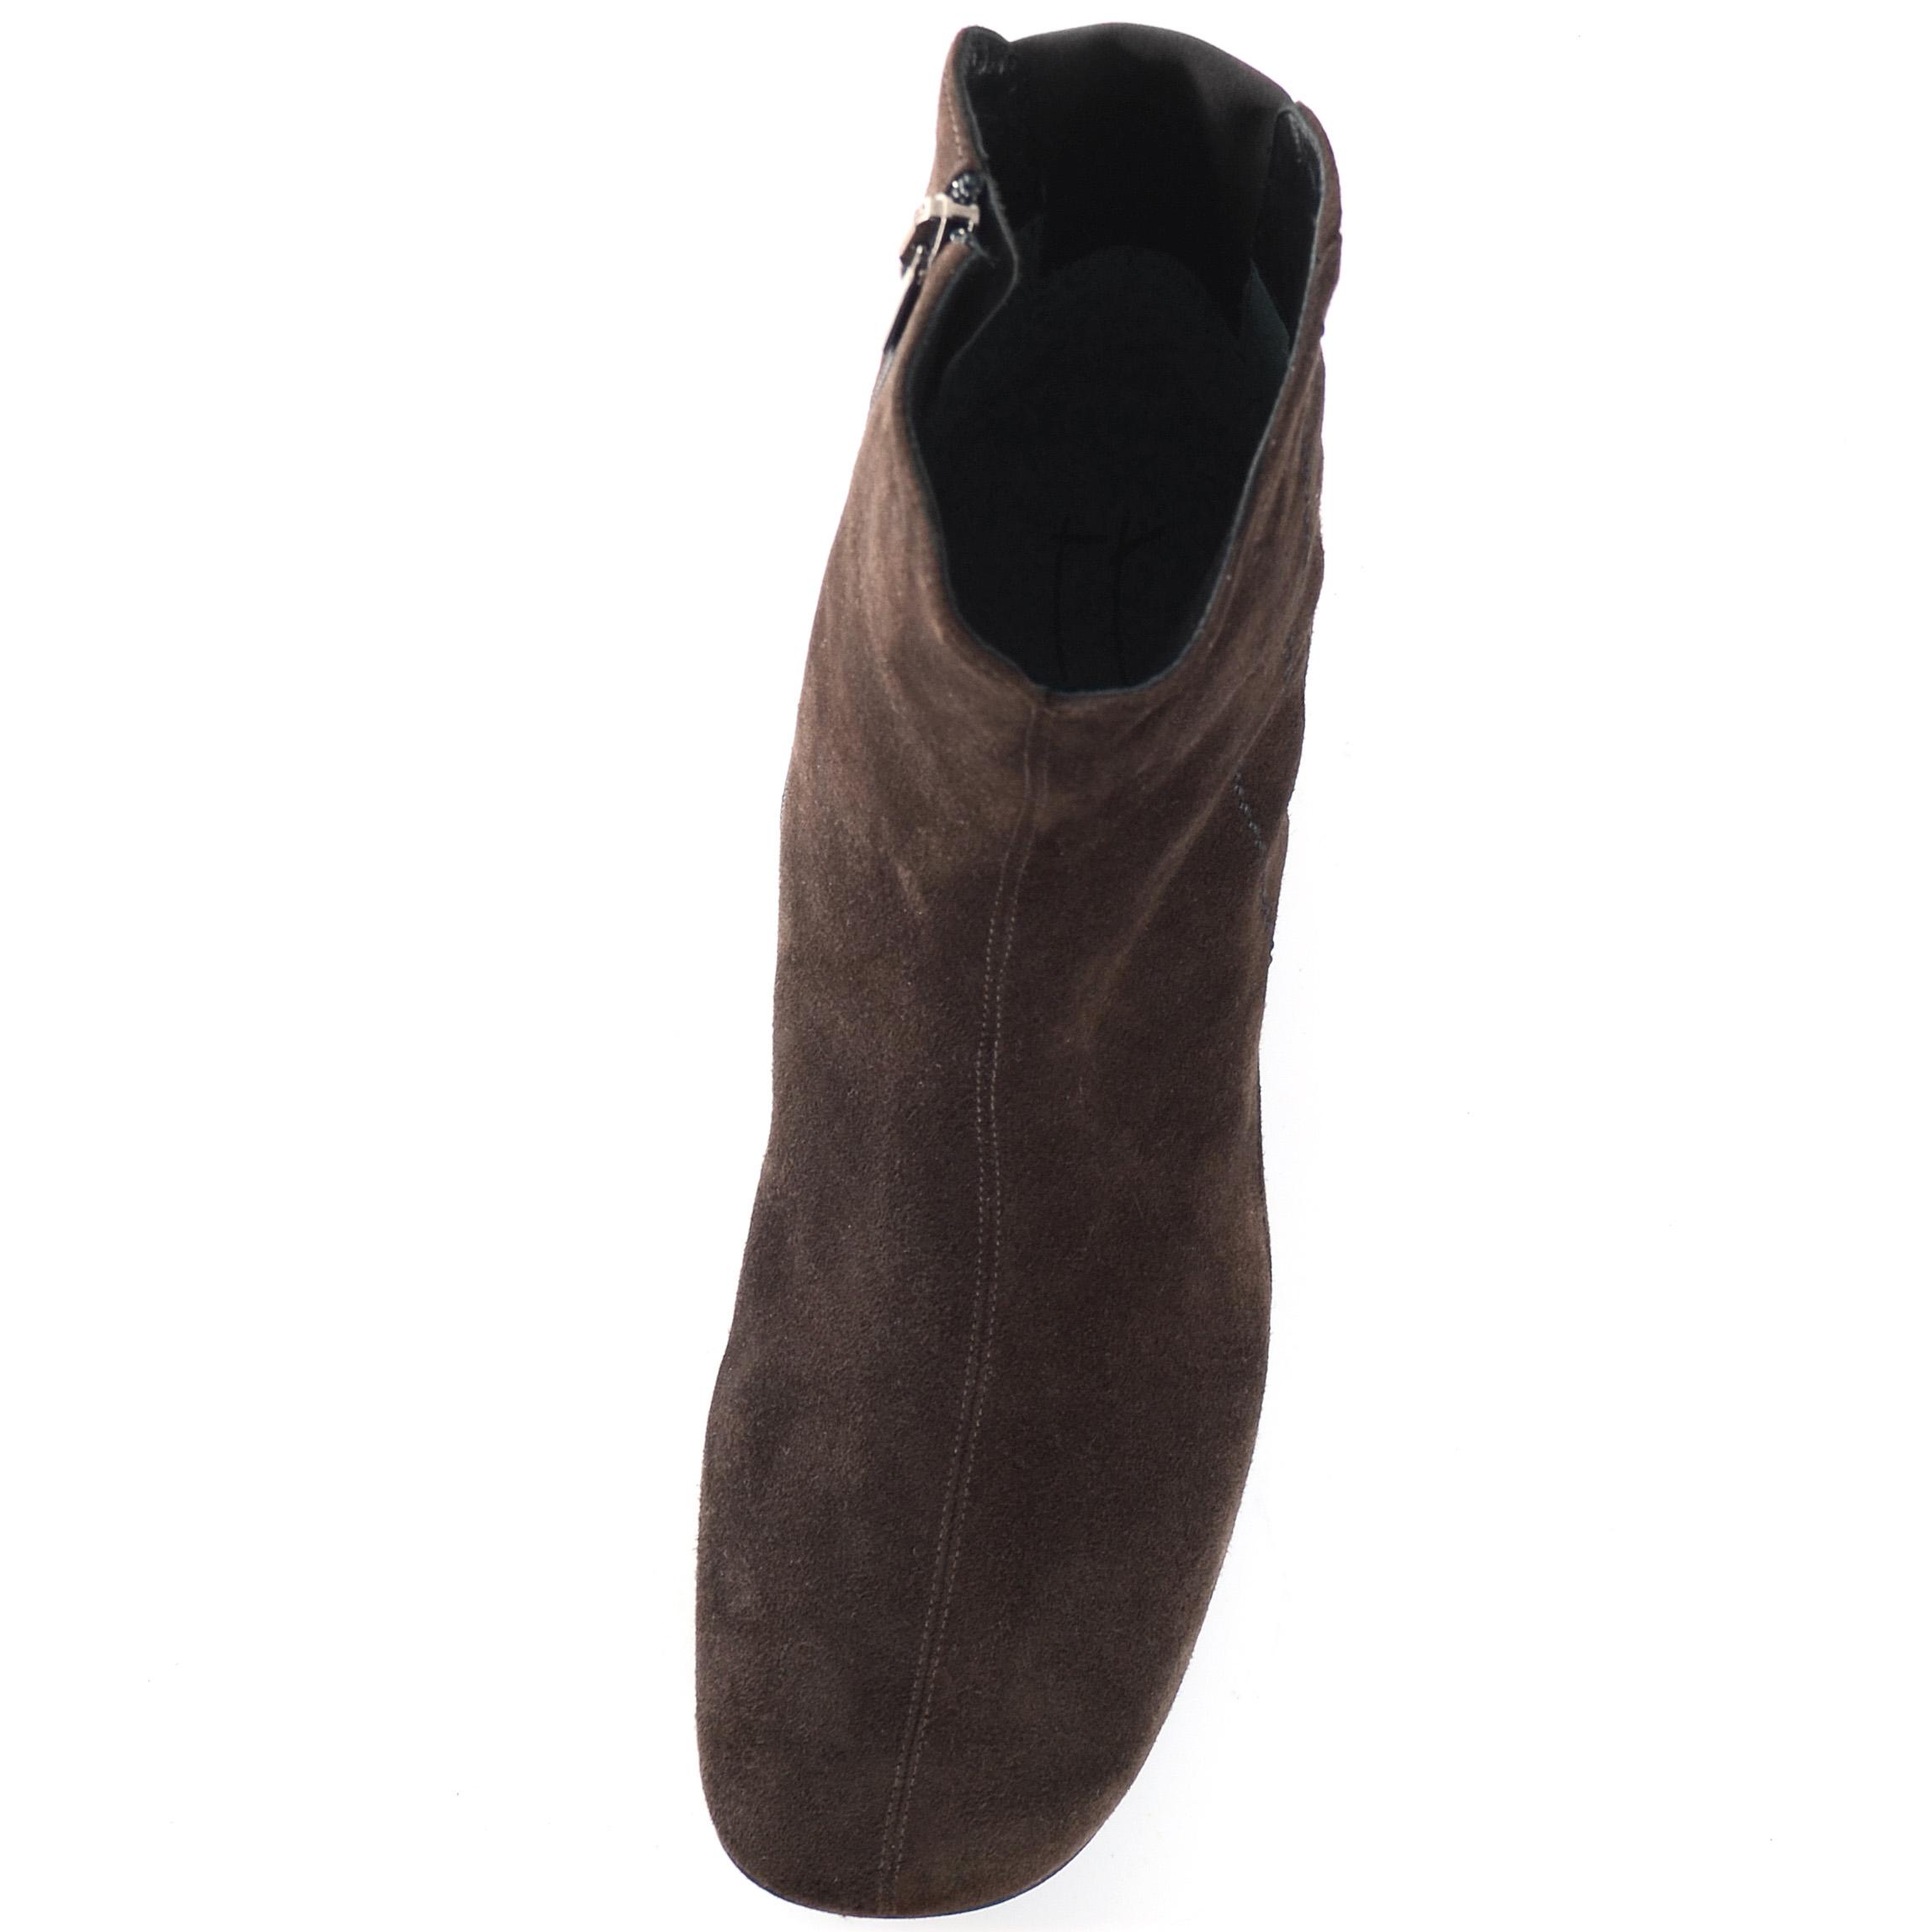 Замшевые ботинки Thierry Rabotin коричневого цвета